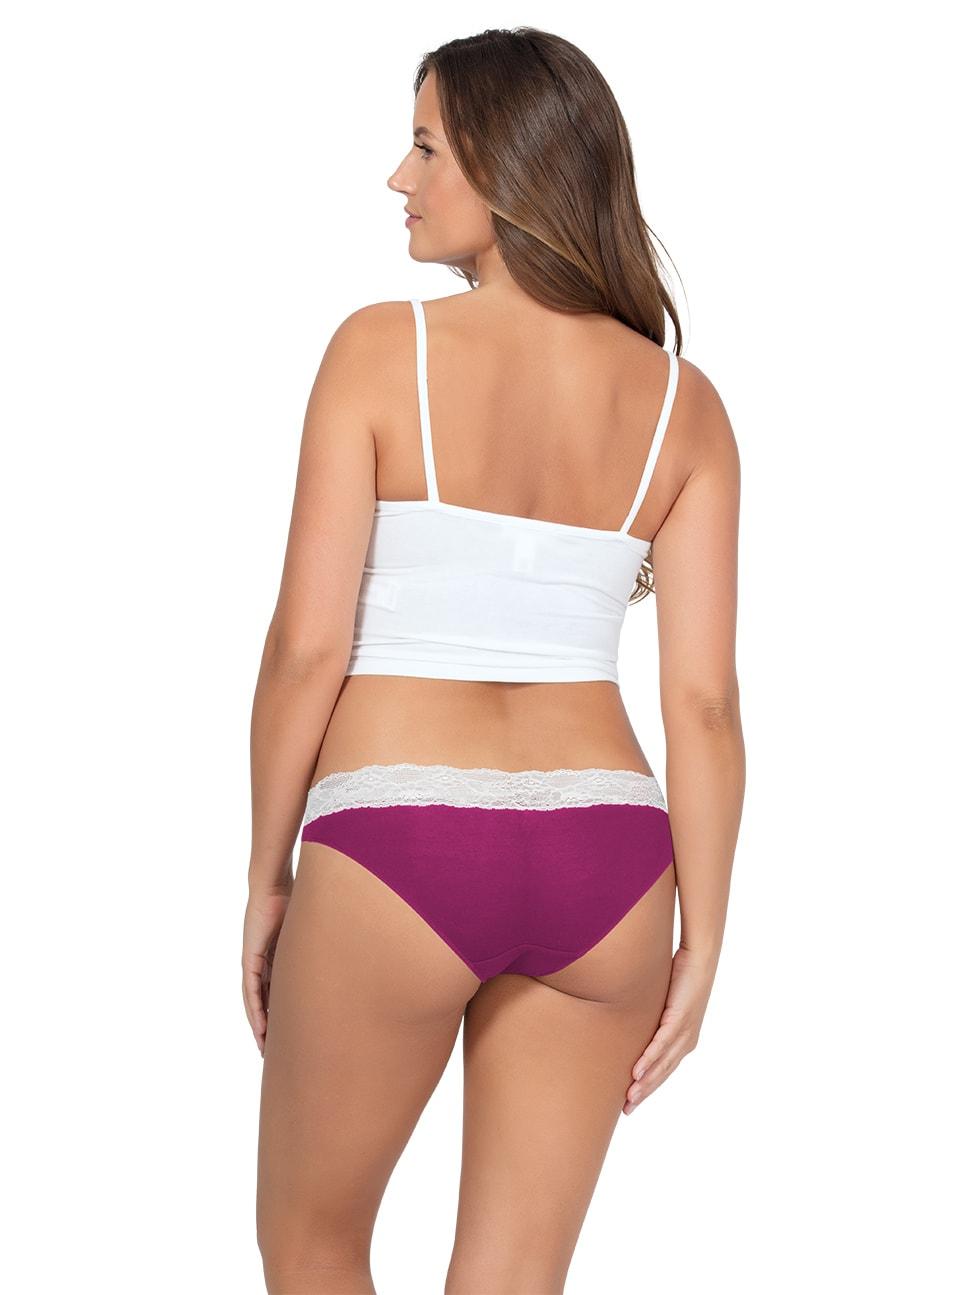 PARFAIT ParfaitPanty SoEssential BikiniPP303 WildPinkIvory Back copy - Panty So Essential Bikini- Wild Pink - PP303